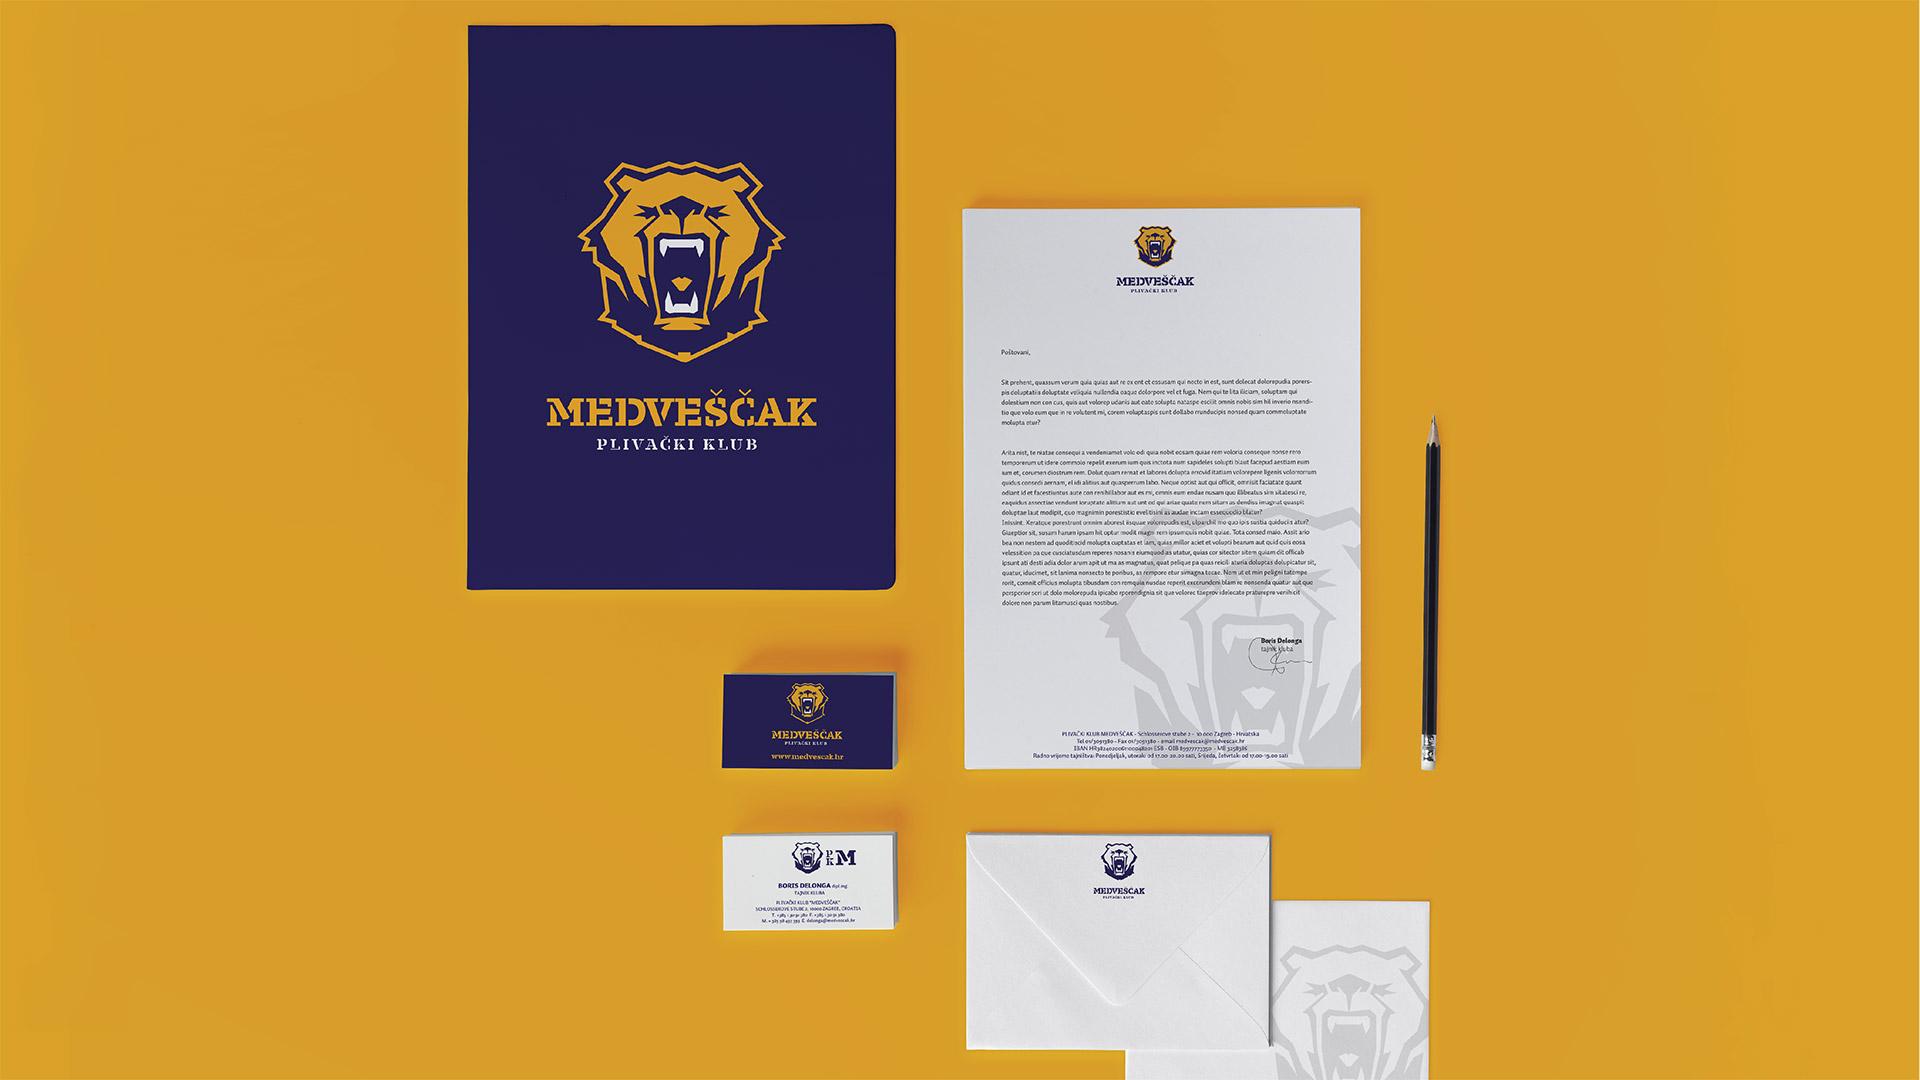 medvescak_pkm-04